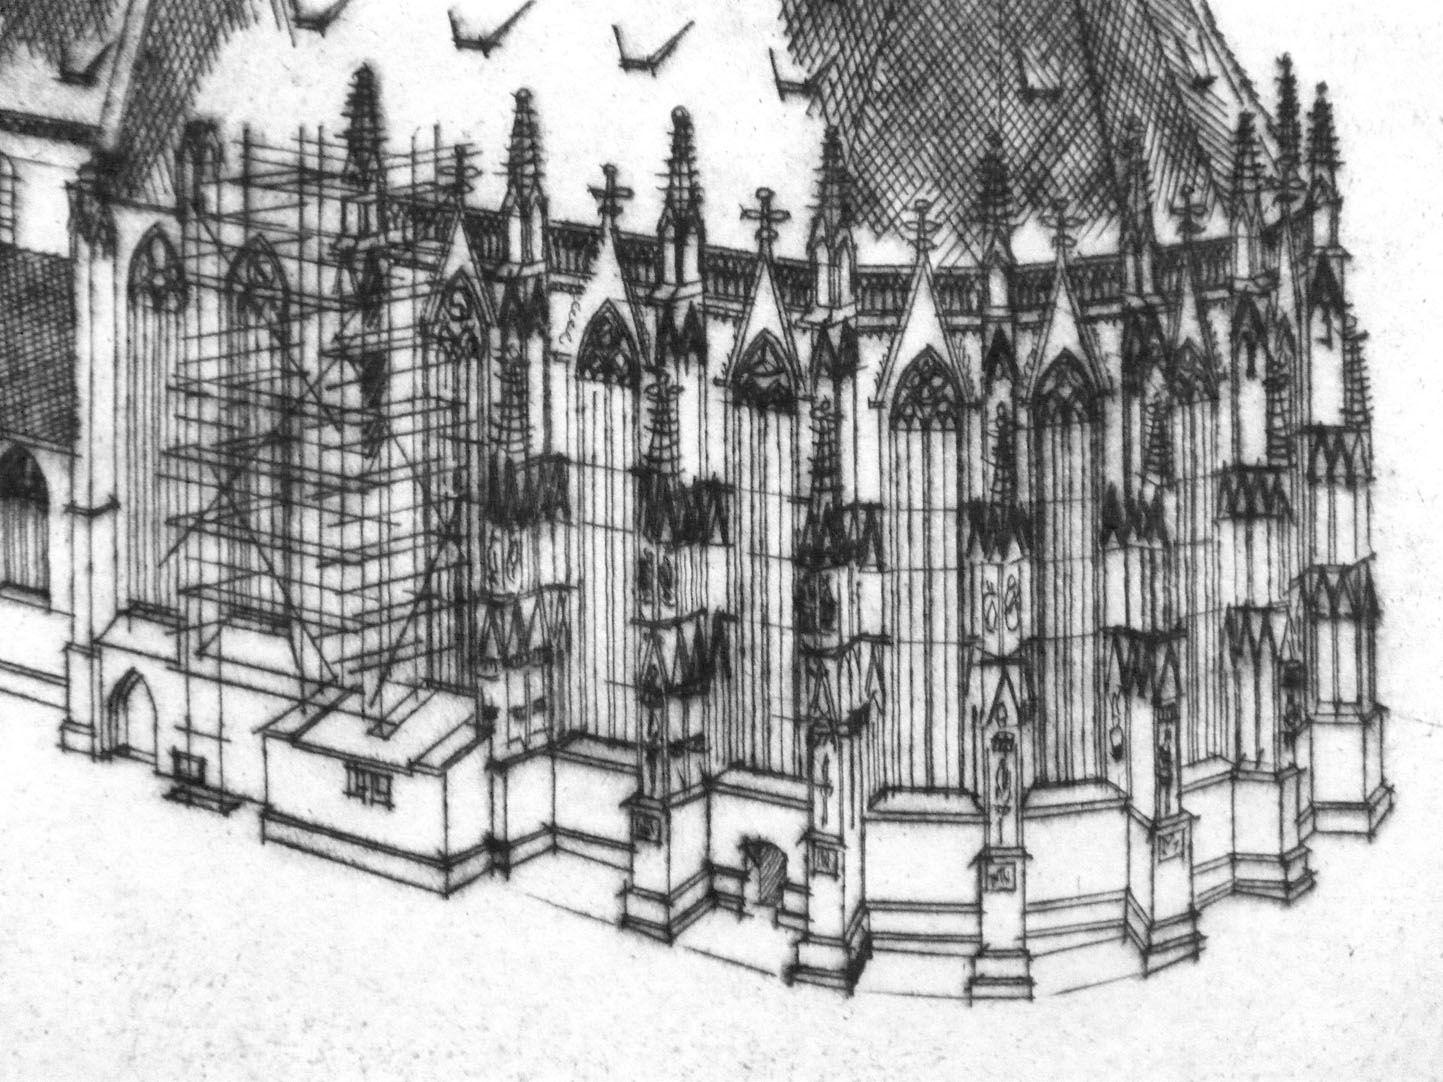 Sankt Sebalduskirche in Nürnberg, 600 Jahre Hallenchor, 1379 - 1979 Chor von St. Sebald